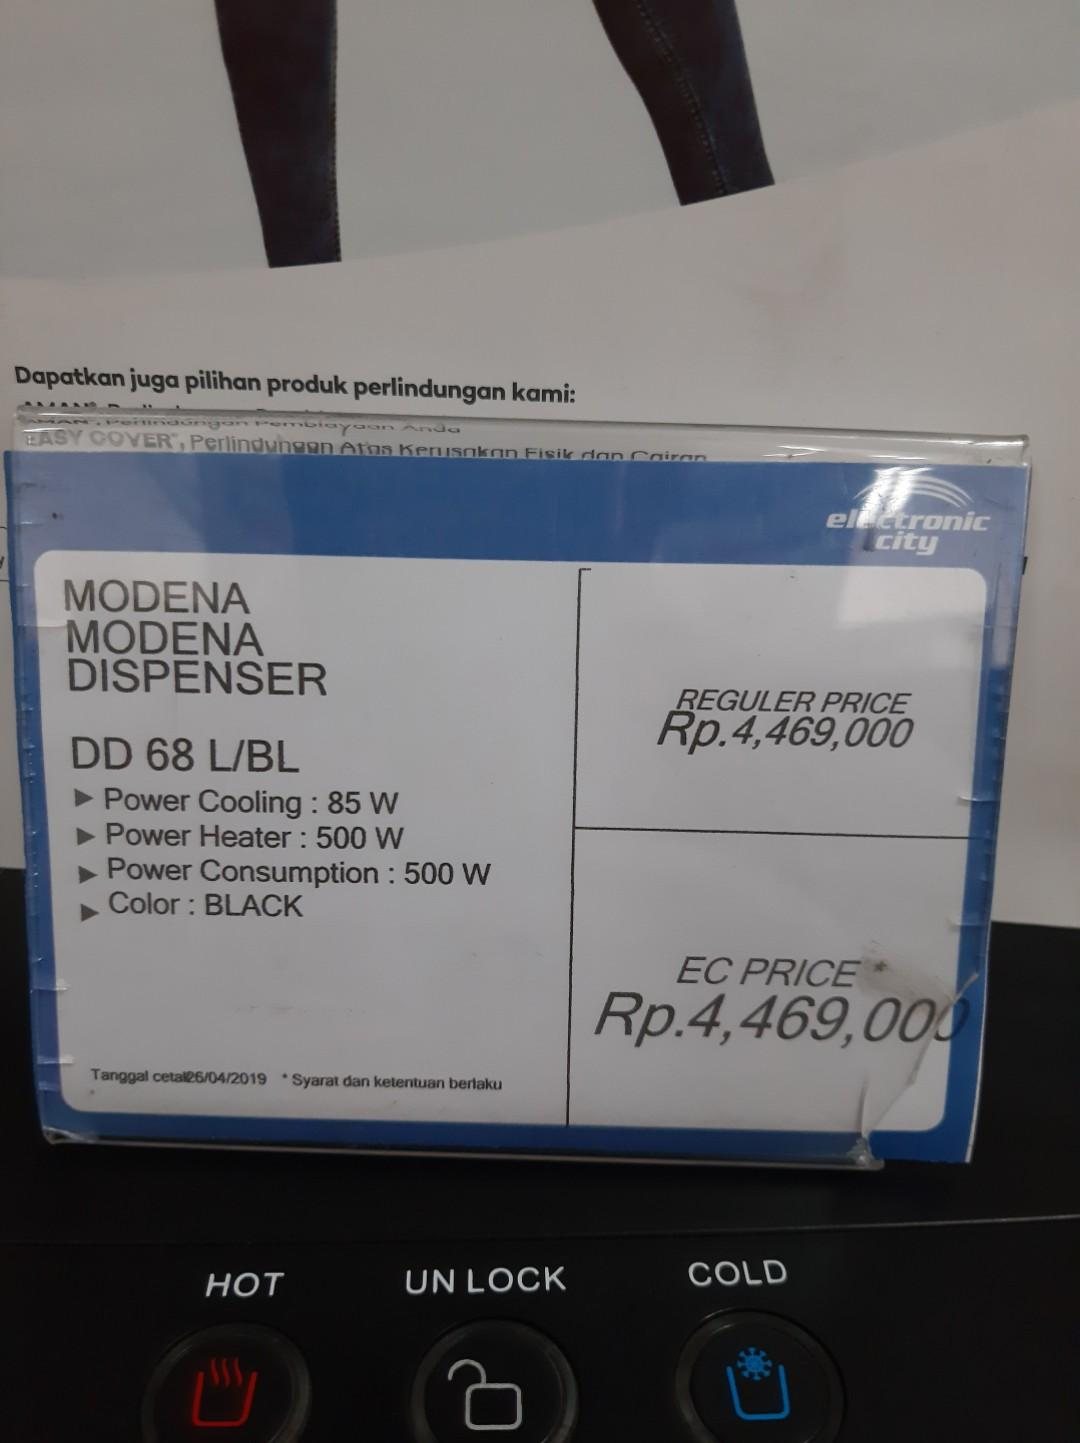 Modena Dispenser Cicilan Bunga 0% Tanpa Kartu kredit